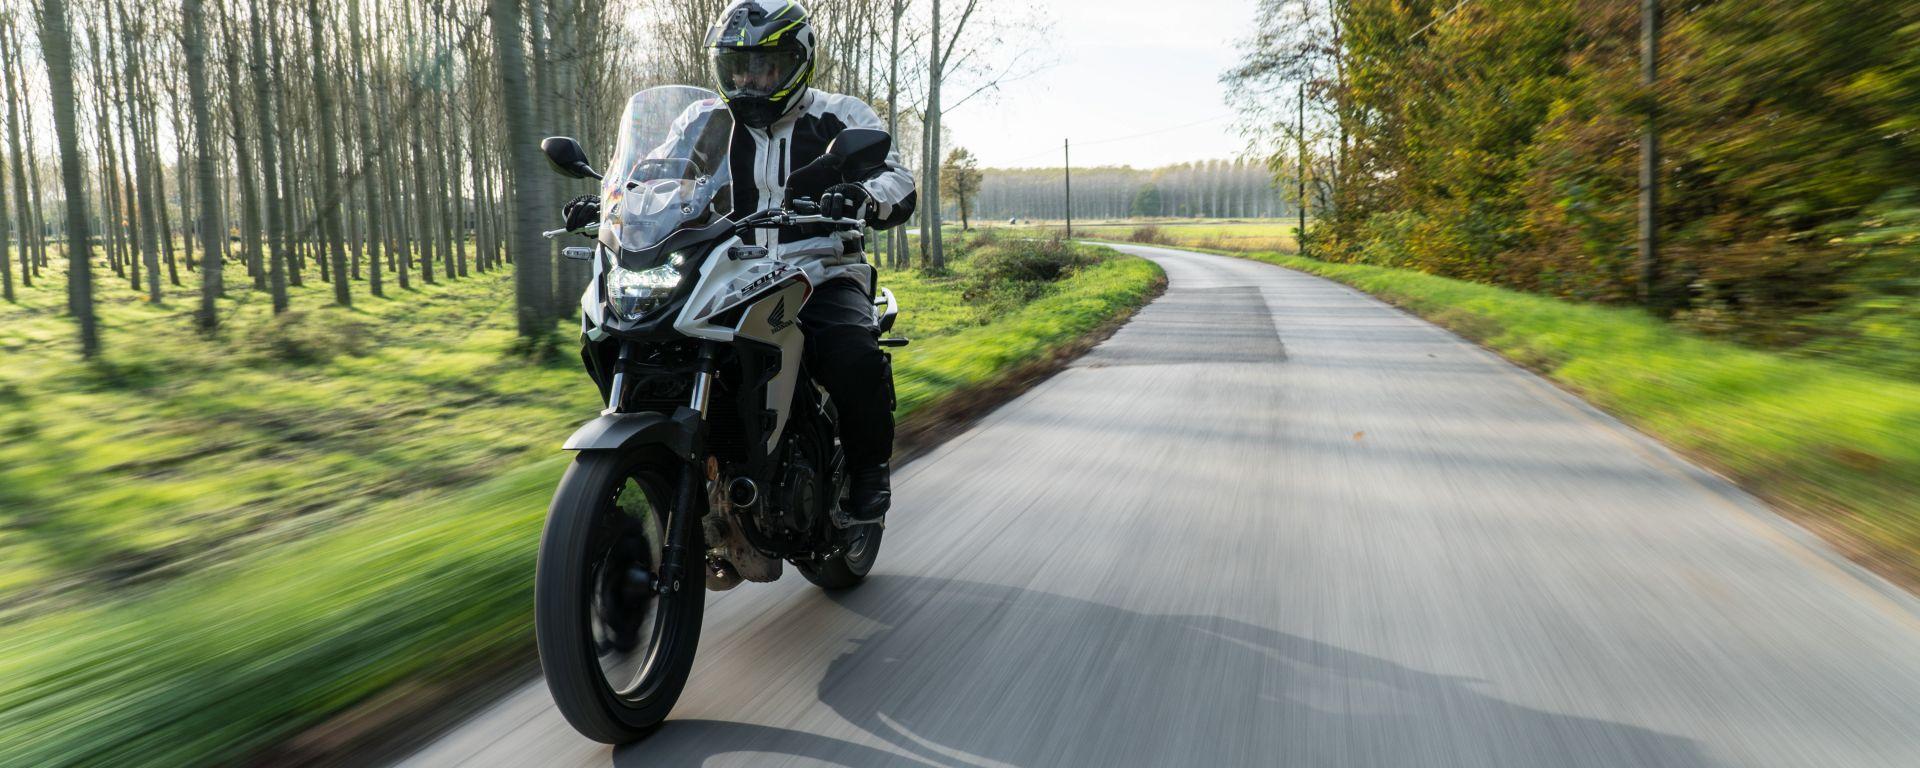 Honda CB500X 2021: la prova su strada